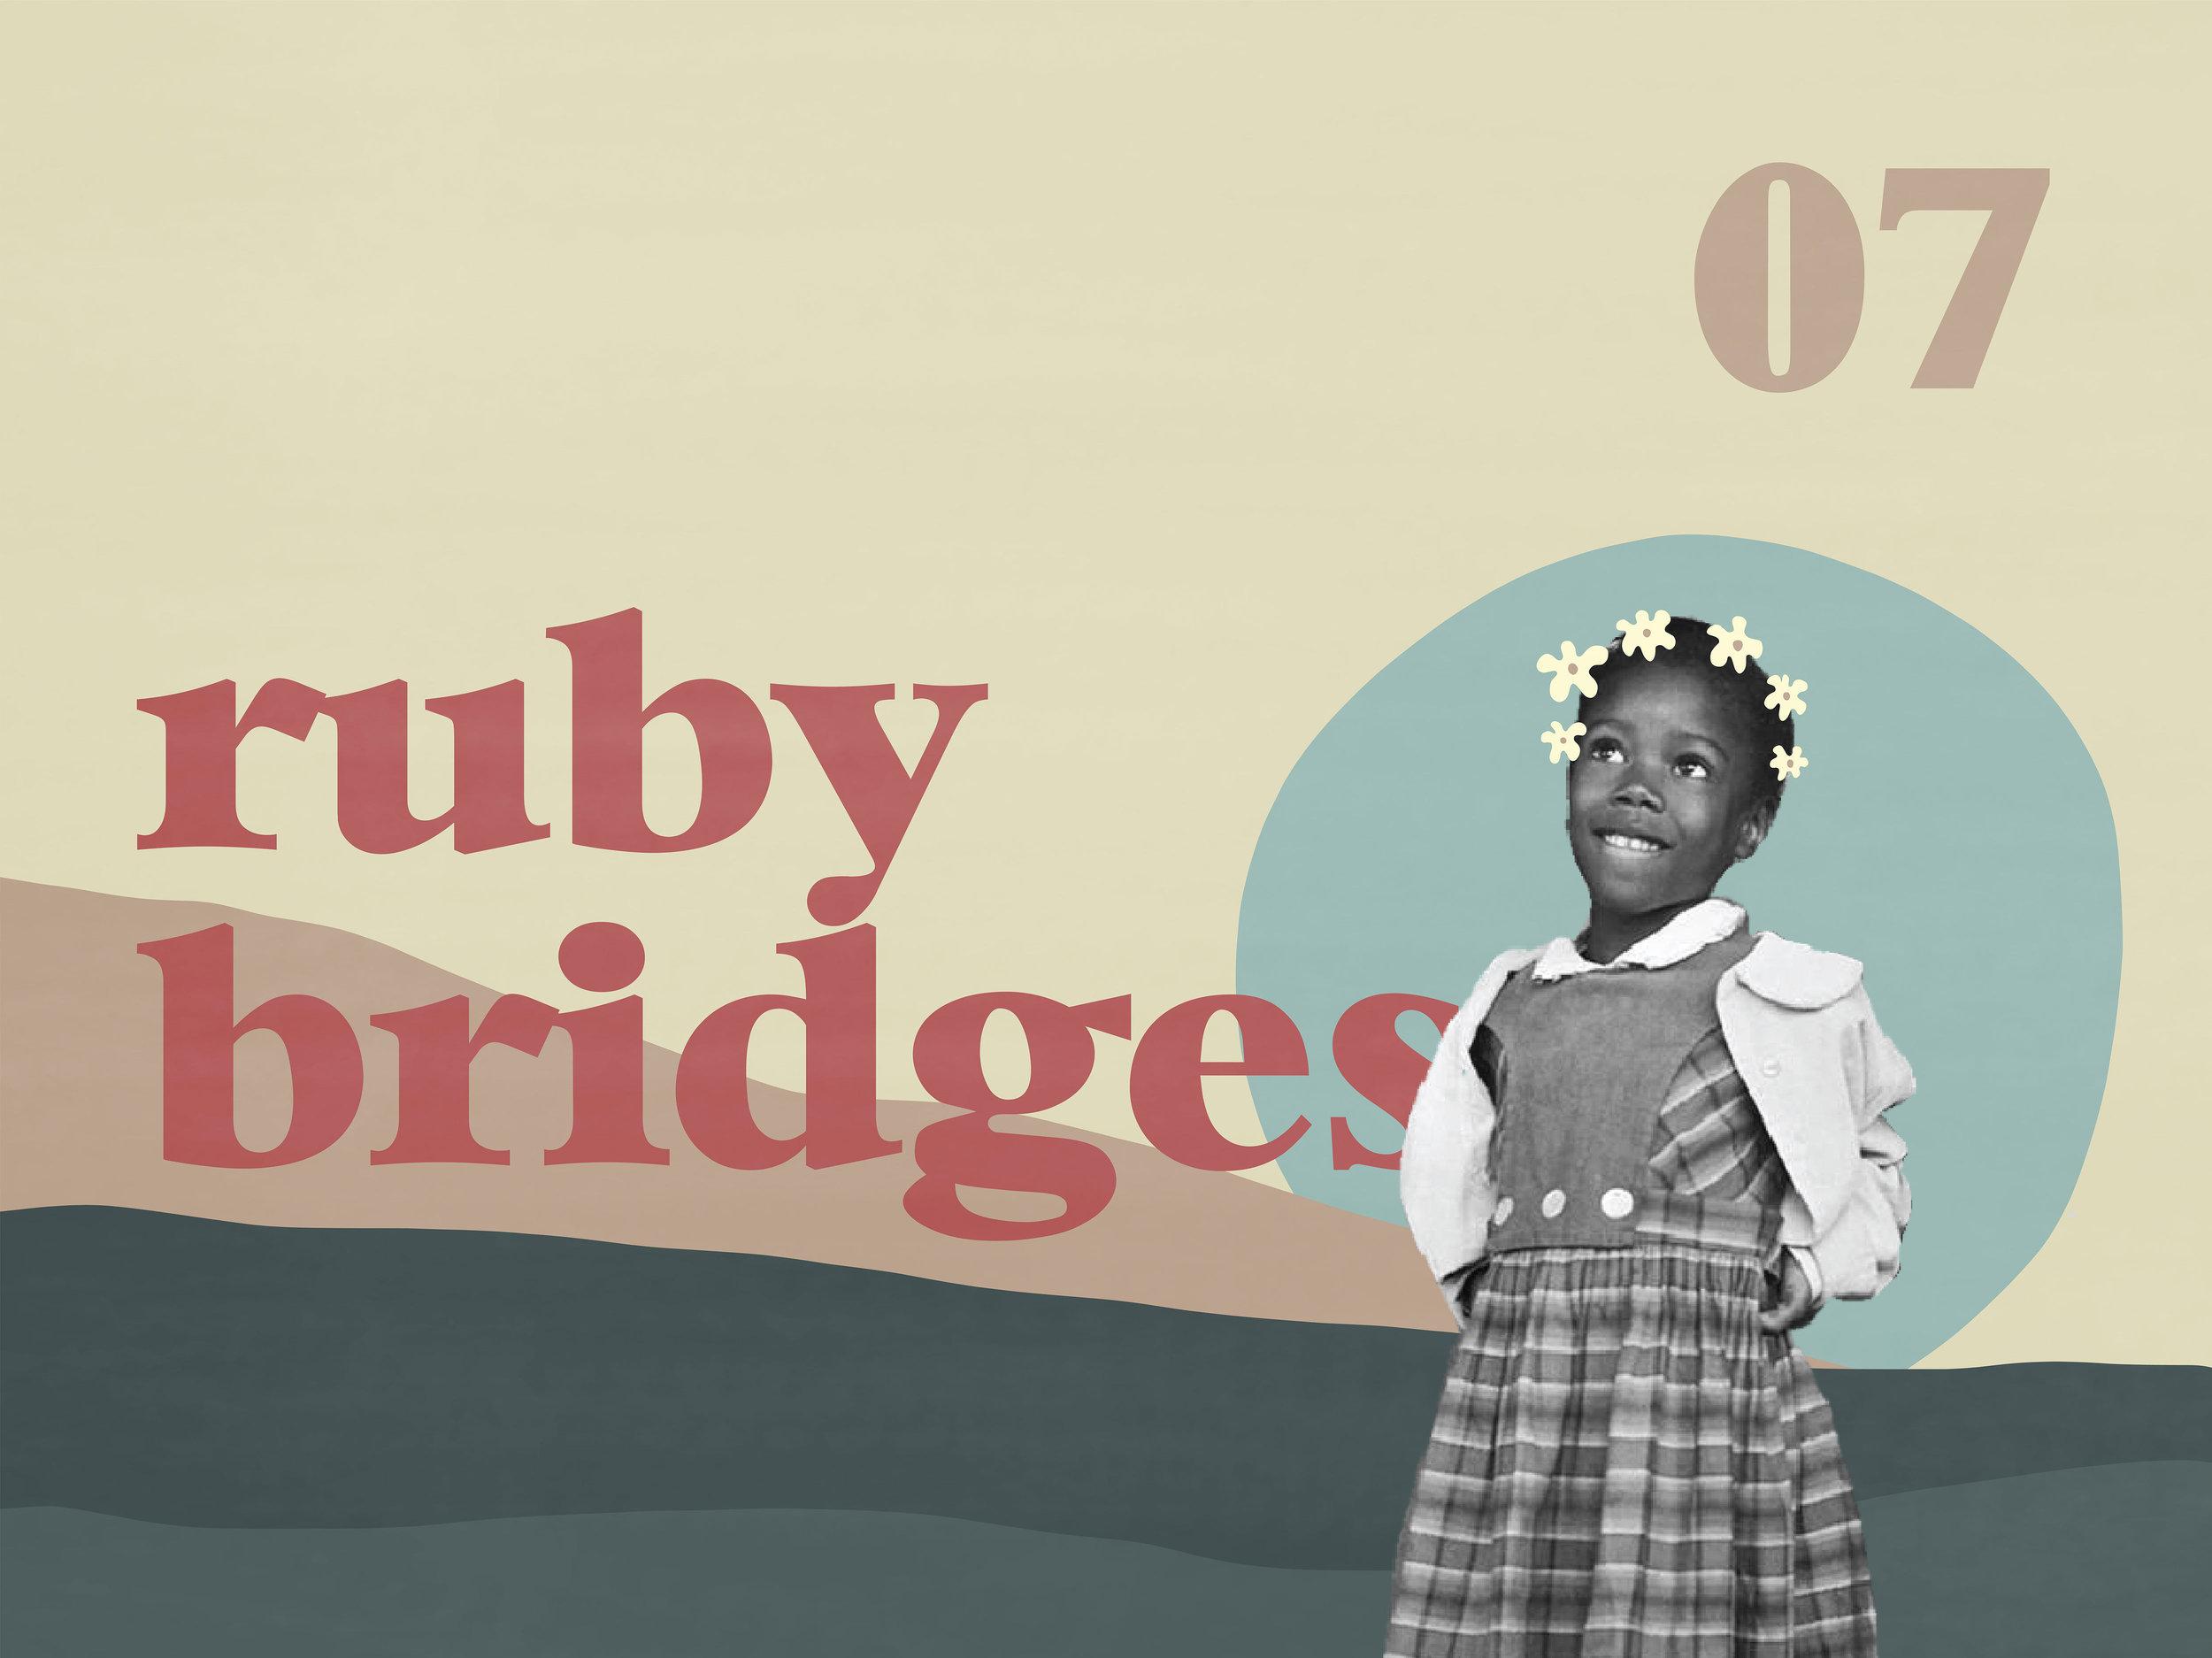 7rubybridges.jpg